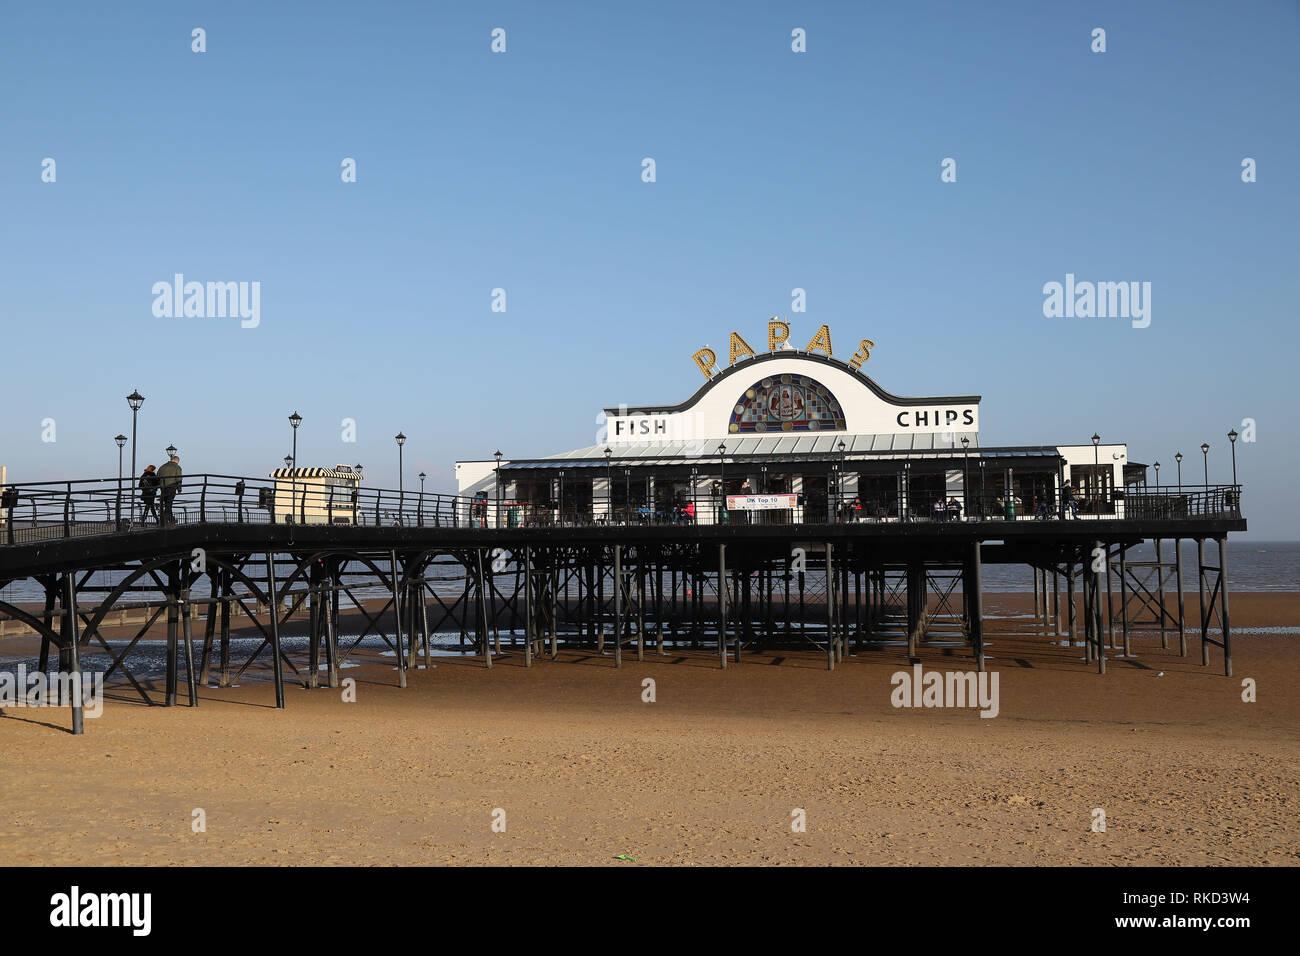 Cleethorpes Pier on Cleethorpes Beach. Stock Photo